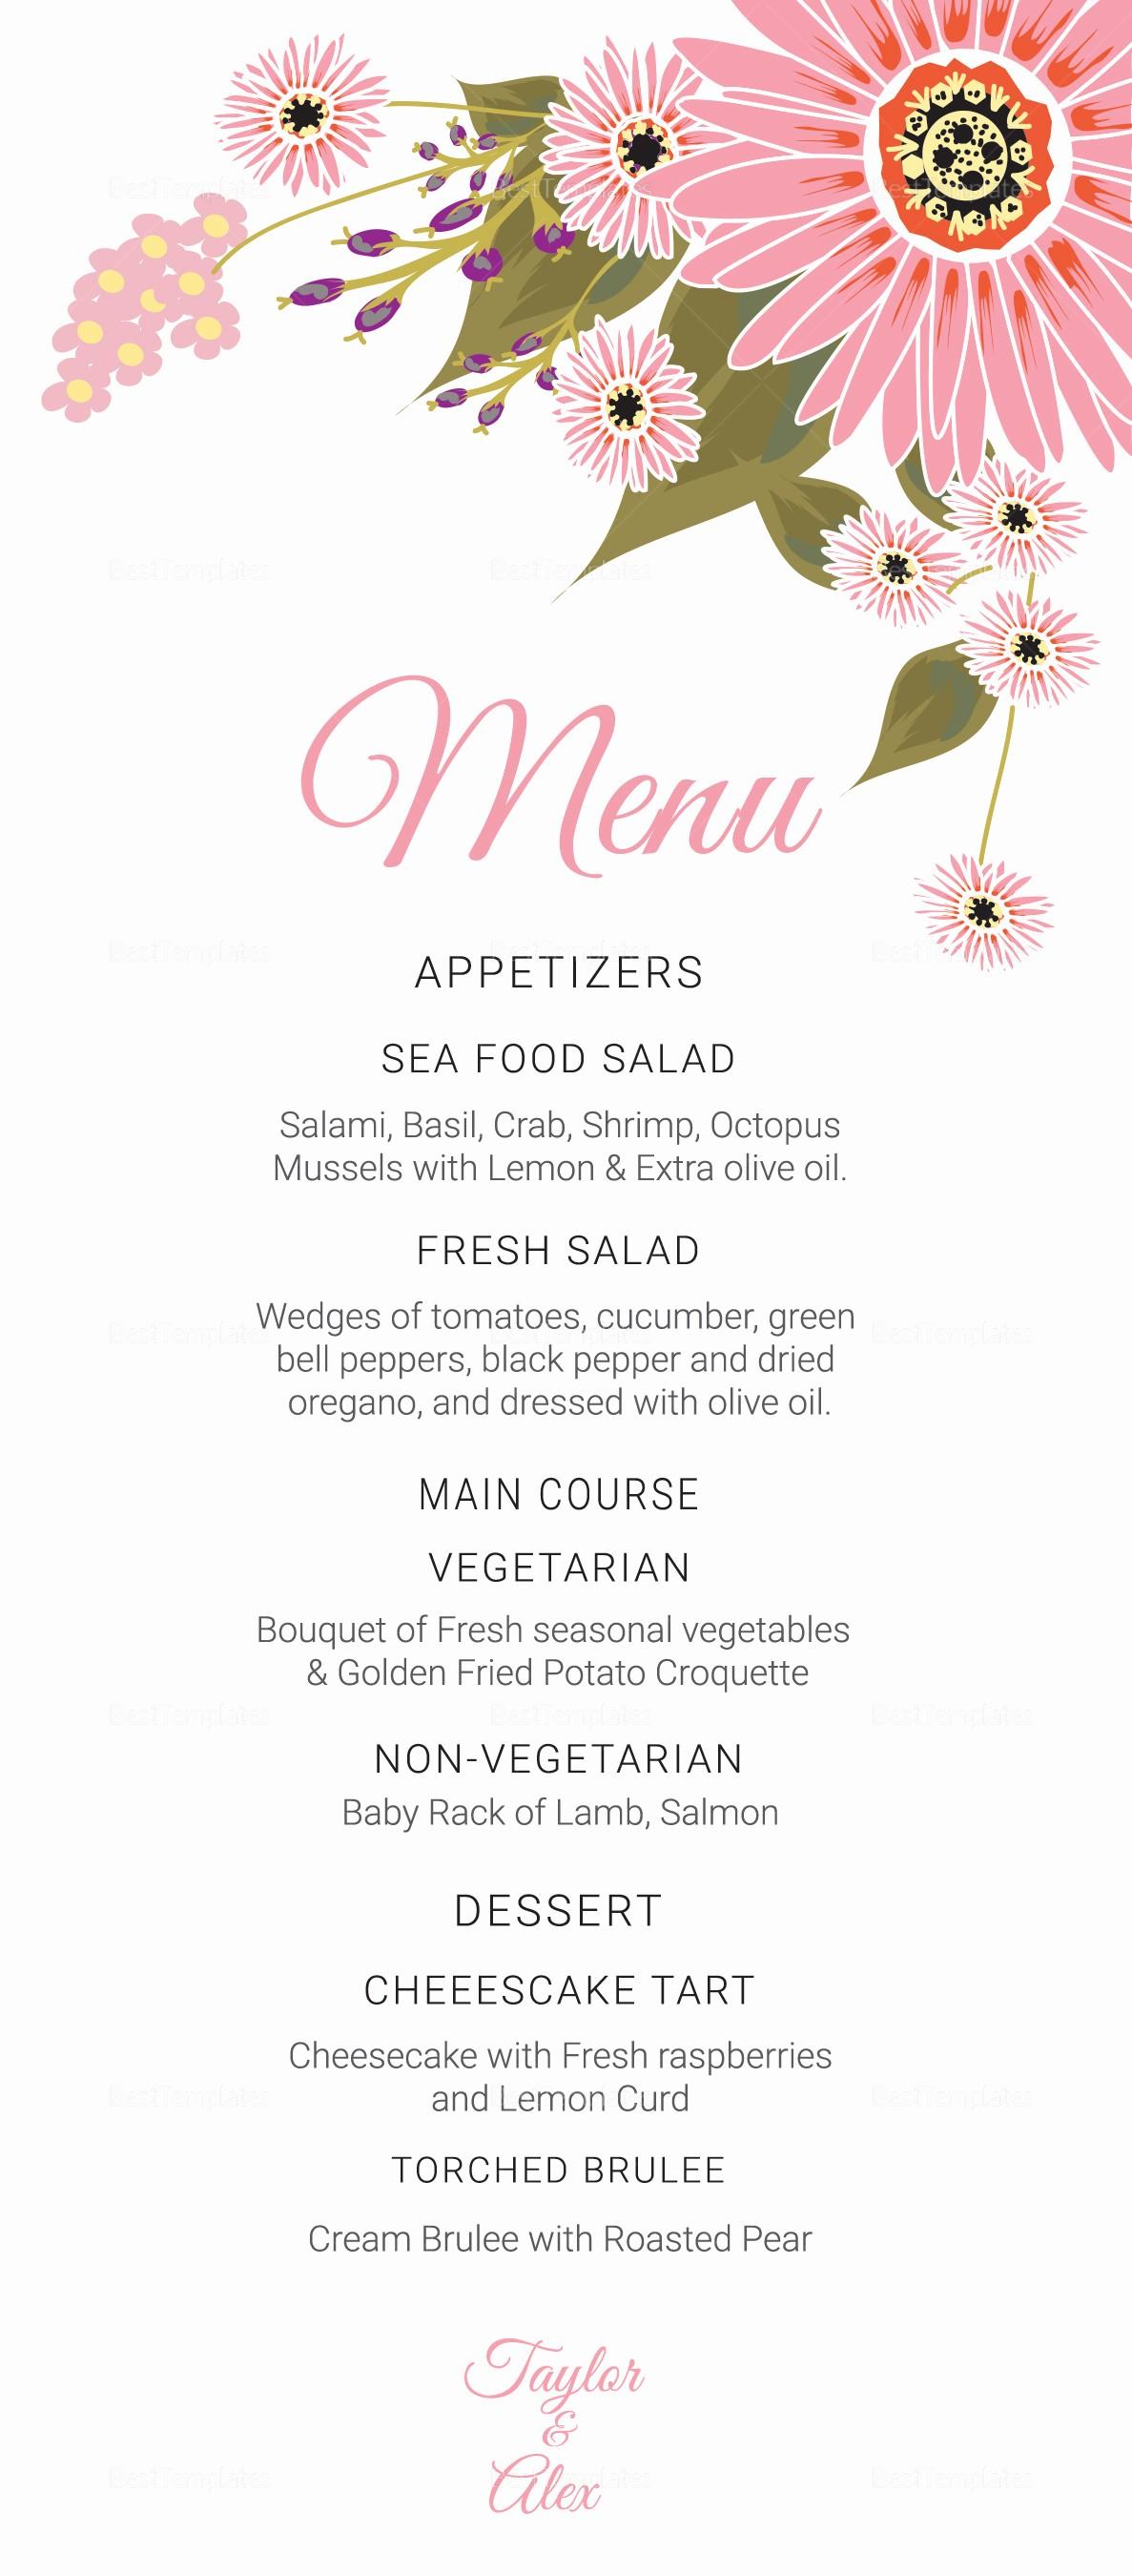 Wedding Menu Template Microsoft Word Beautiful Floral Wedding Menu Card Design Template In Illustrator